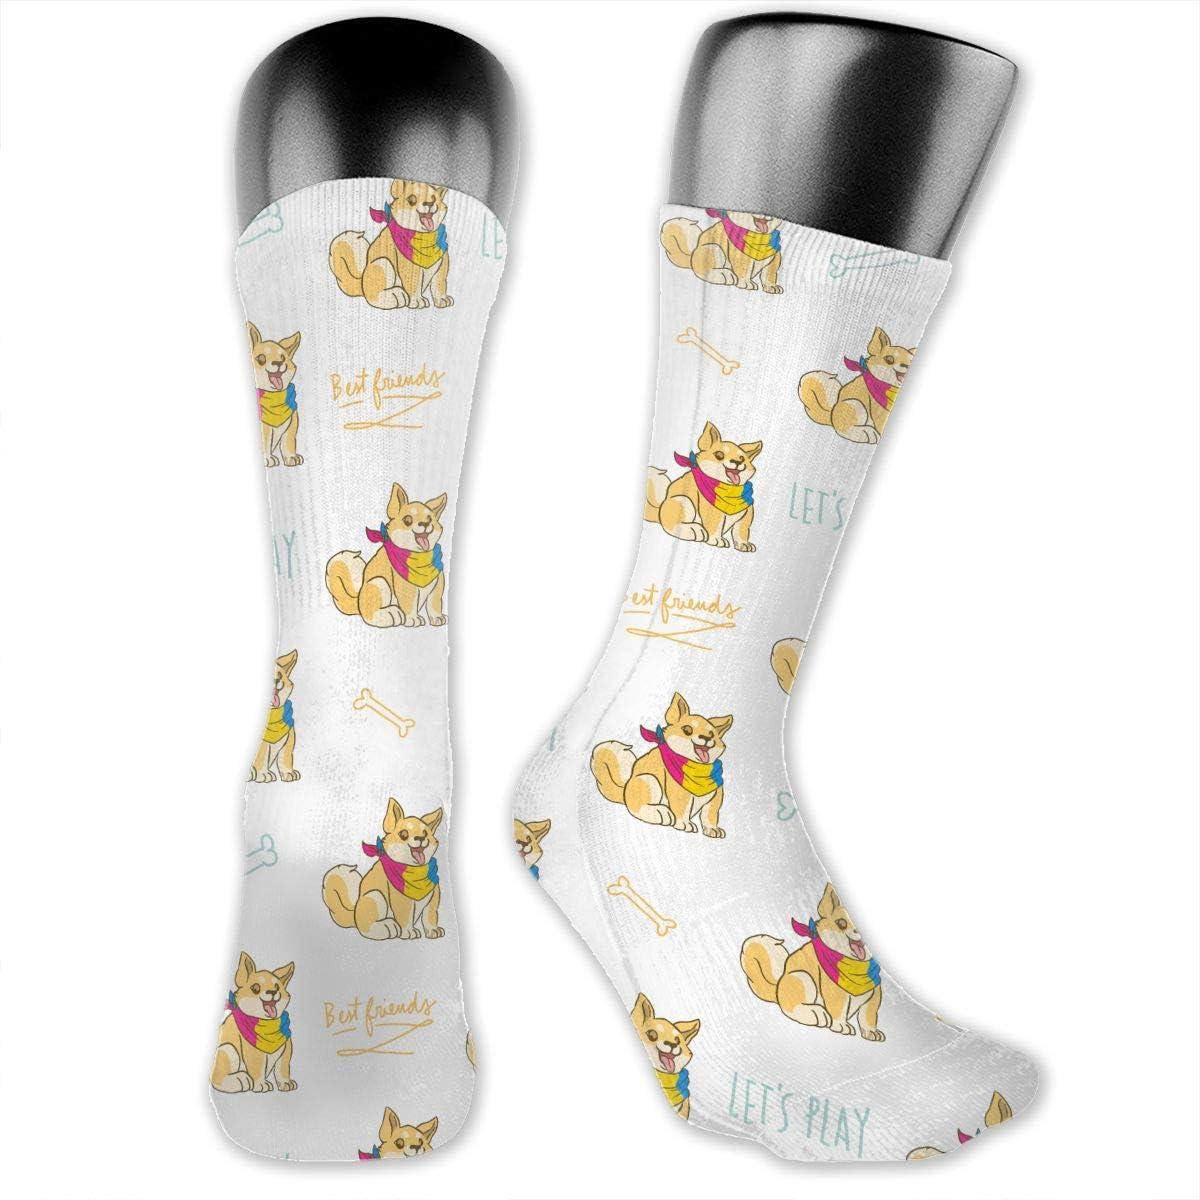 Casual Shiba Inu Pansexual Pride Socks Cotton Dress Socks For Men Women